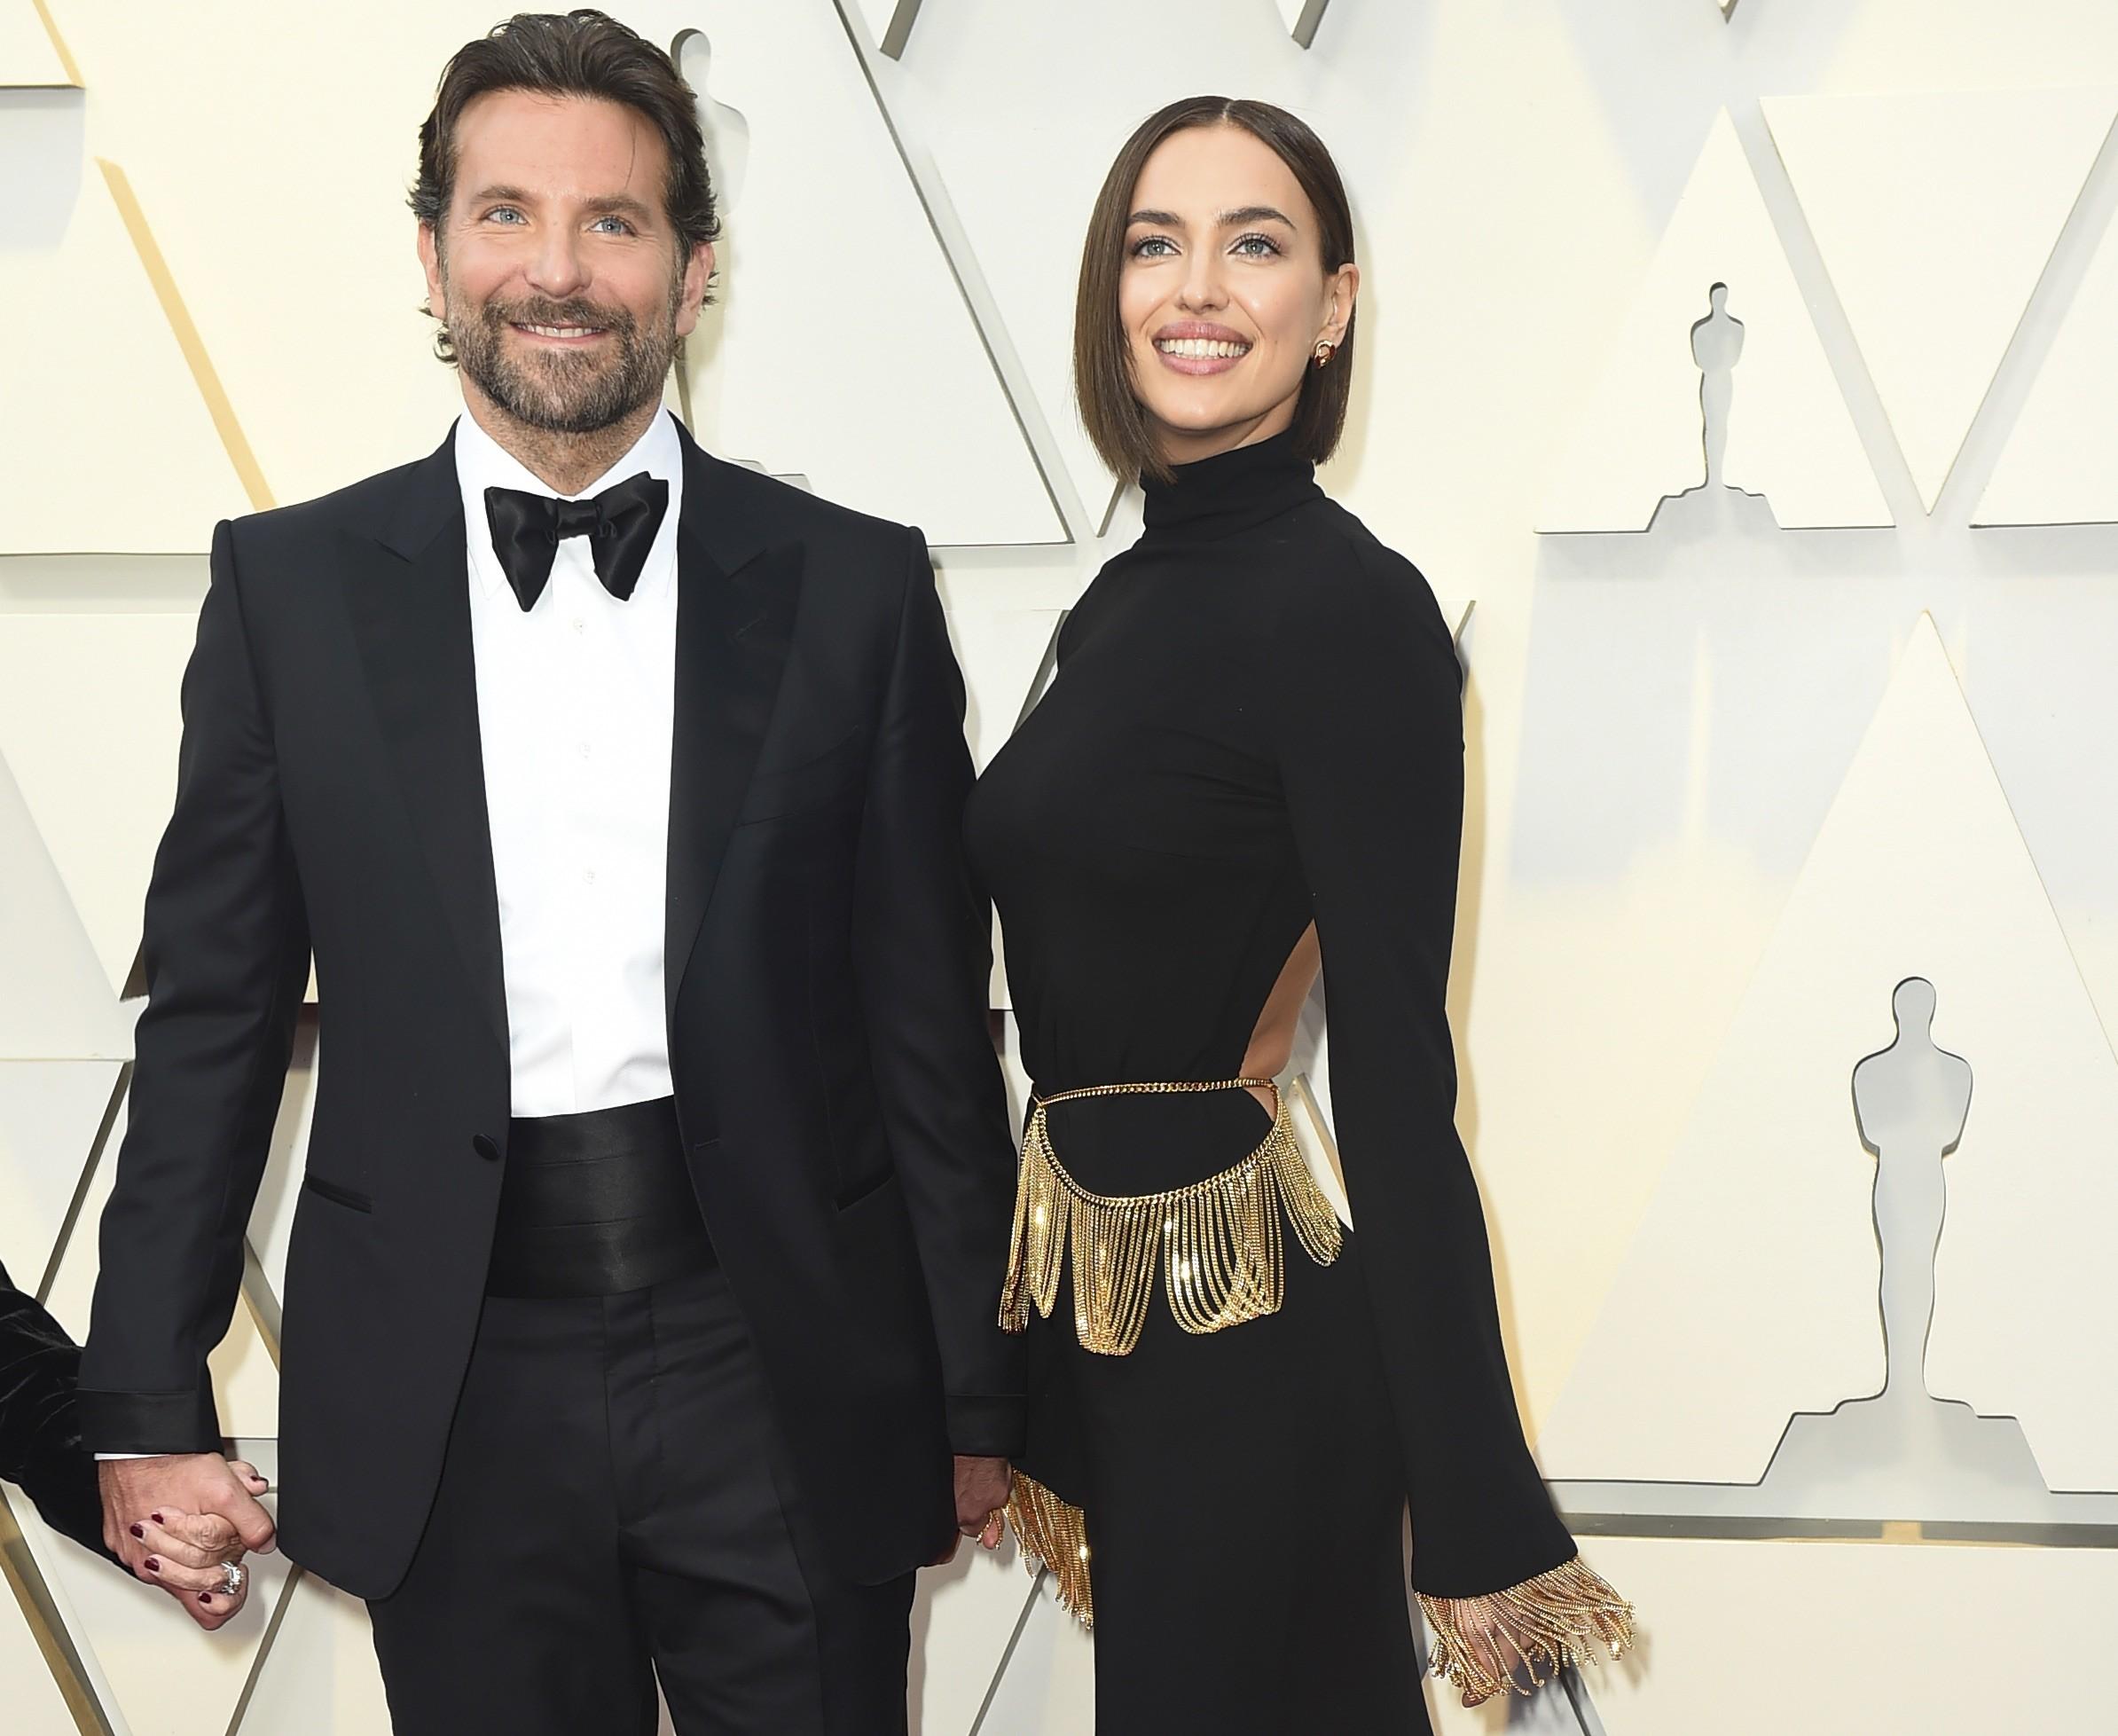 Premios Oscar 2019  Irina Shayk se apunta a la elegancia del color negro  para pisar la alfombra roja f5ad7664df5e5